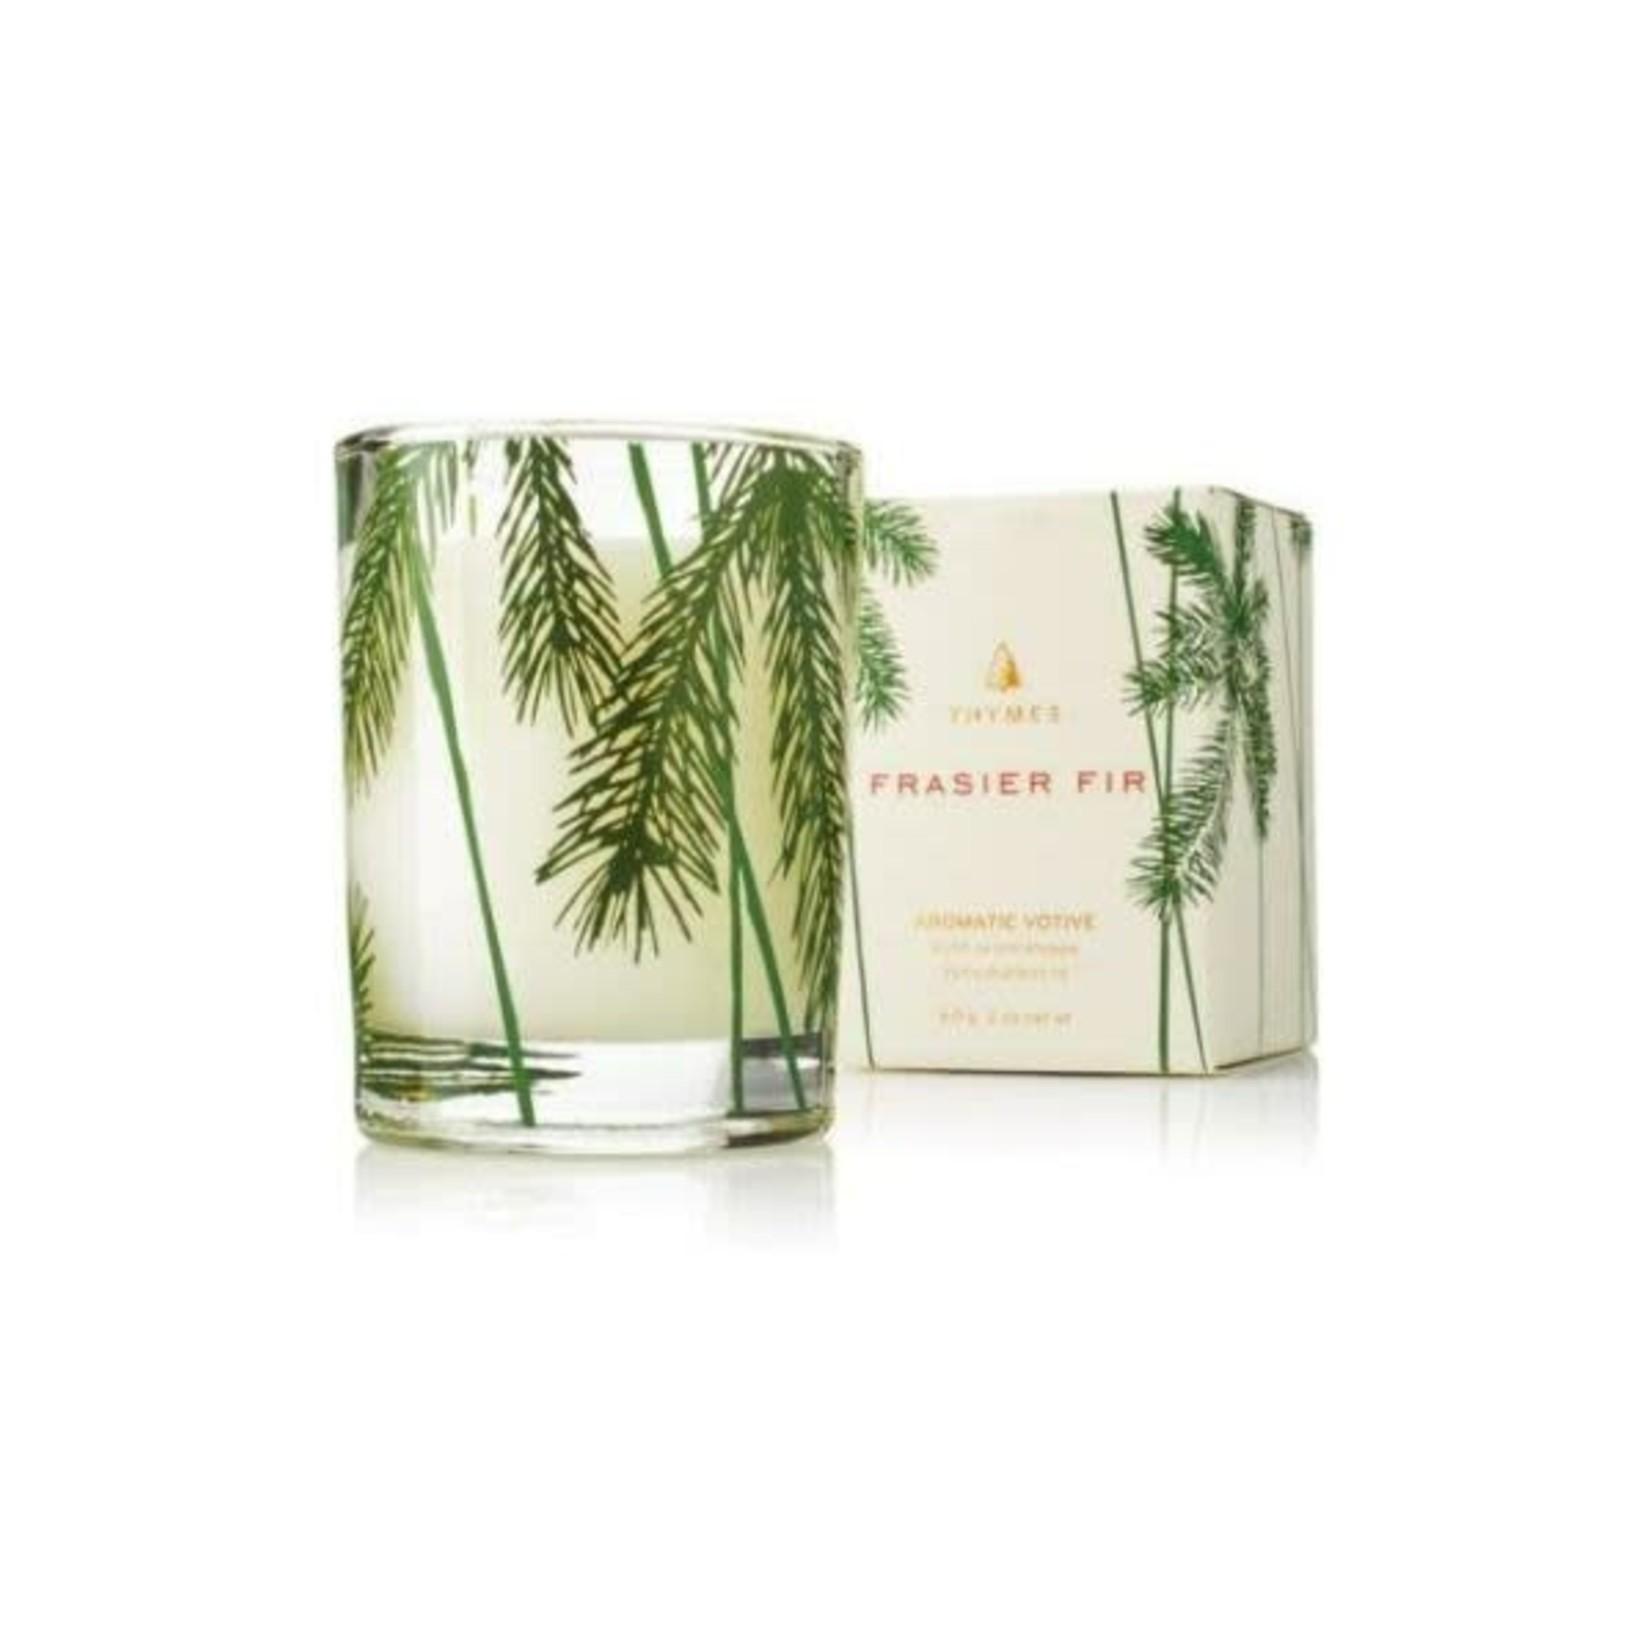 Frasier Fir Votive Candle, Pine Needle Design